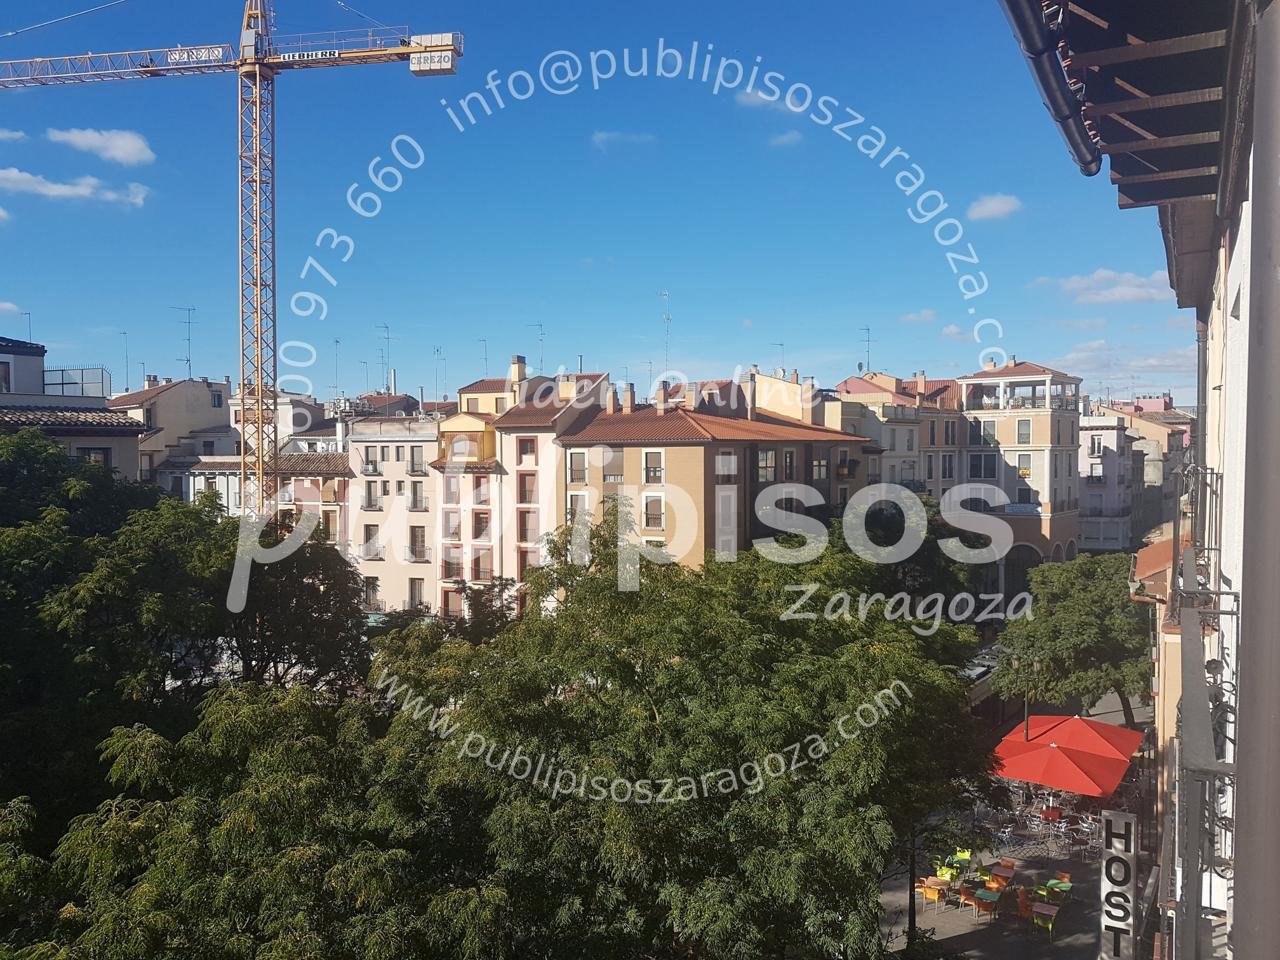 Venta Atico Duplex Obra Nueva Centro Casco Histórico Zaragoza|PUBLIPISOS Inmobiliarias-16